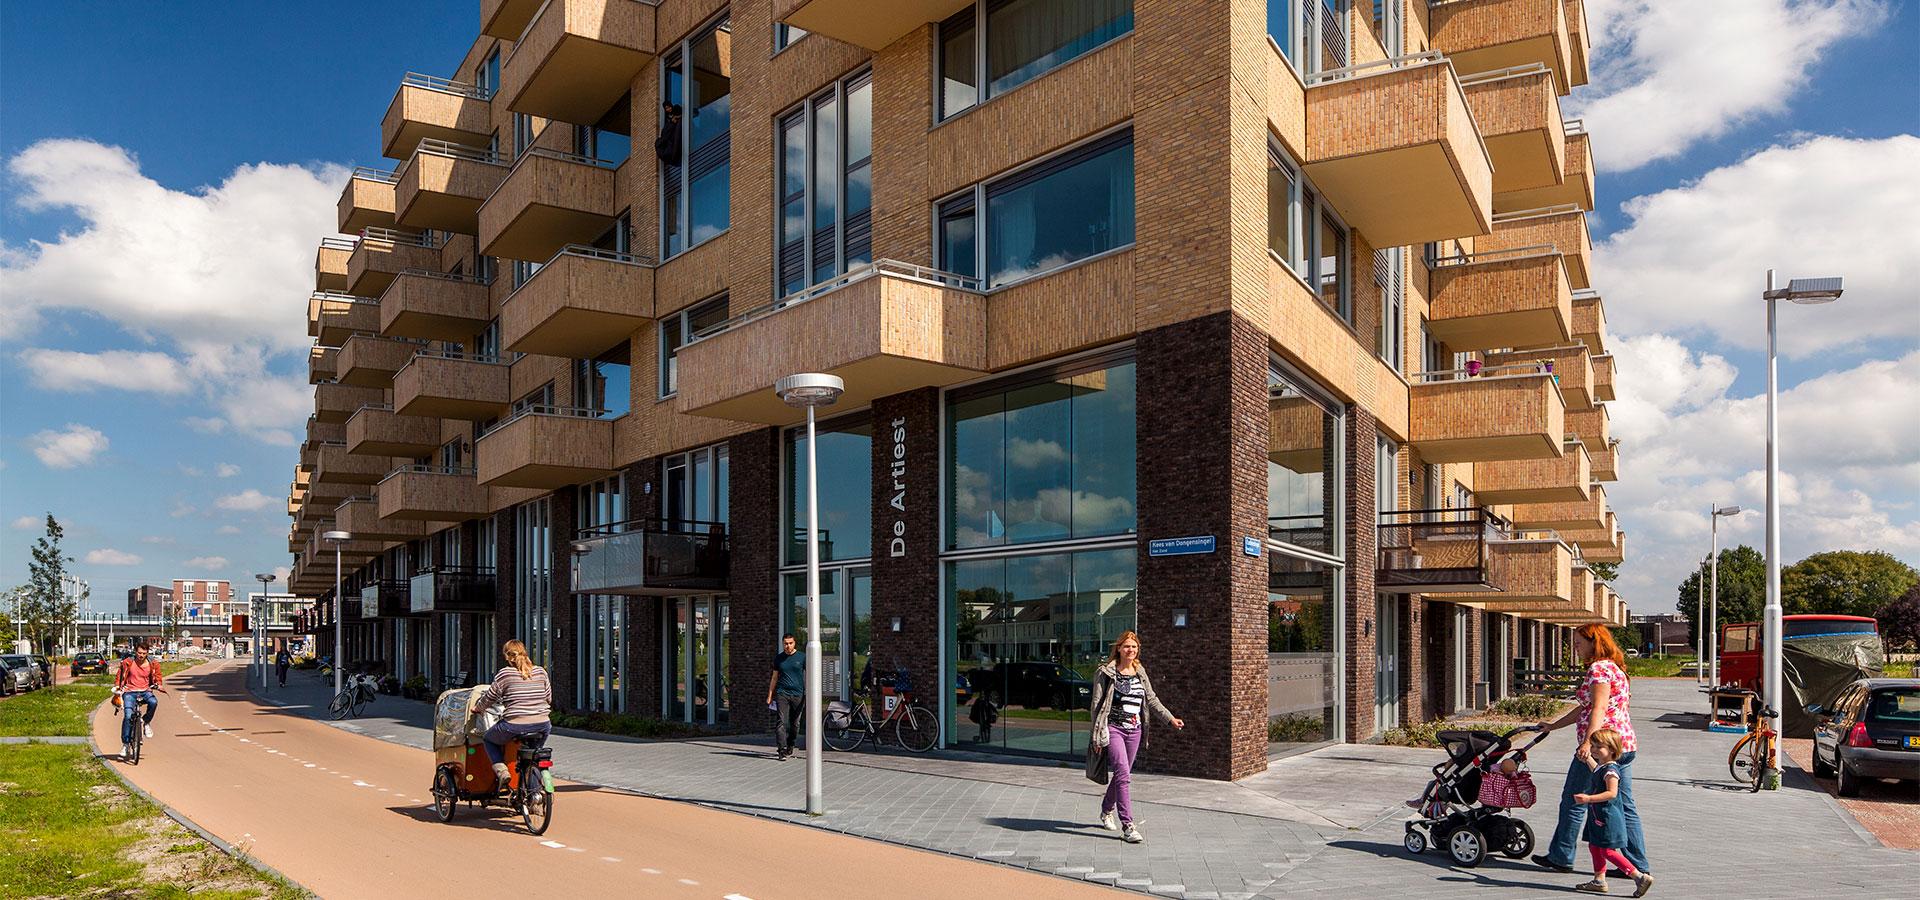 FARO architecten 't Zand Leidsche Rijn Utrecht 07